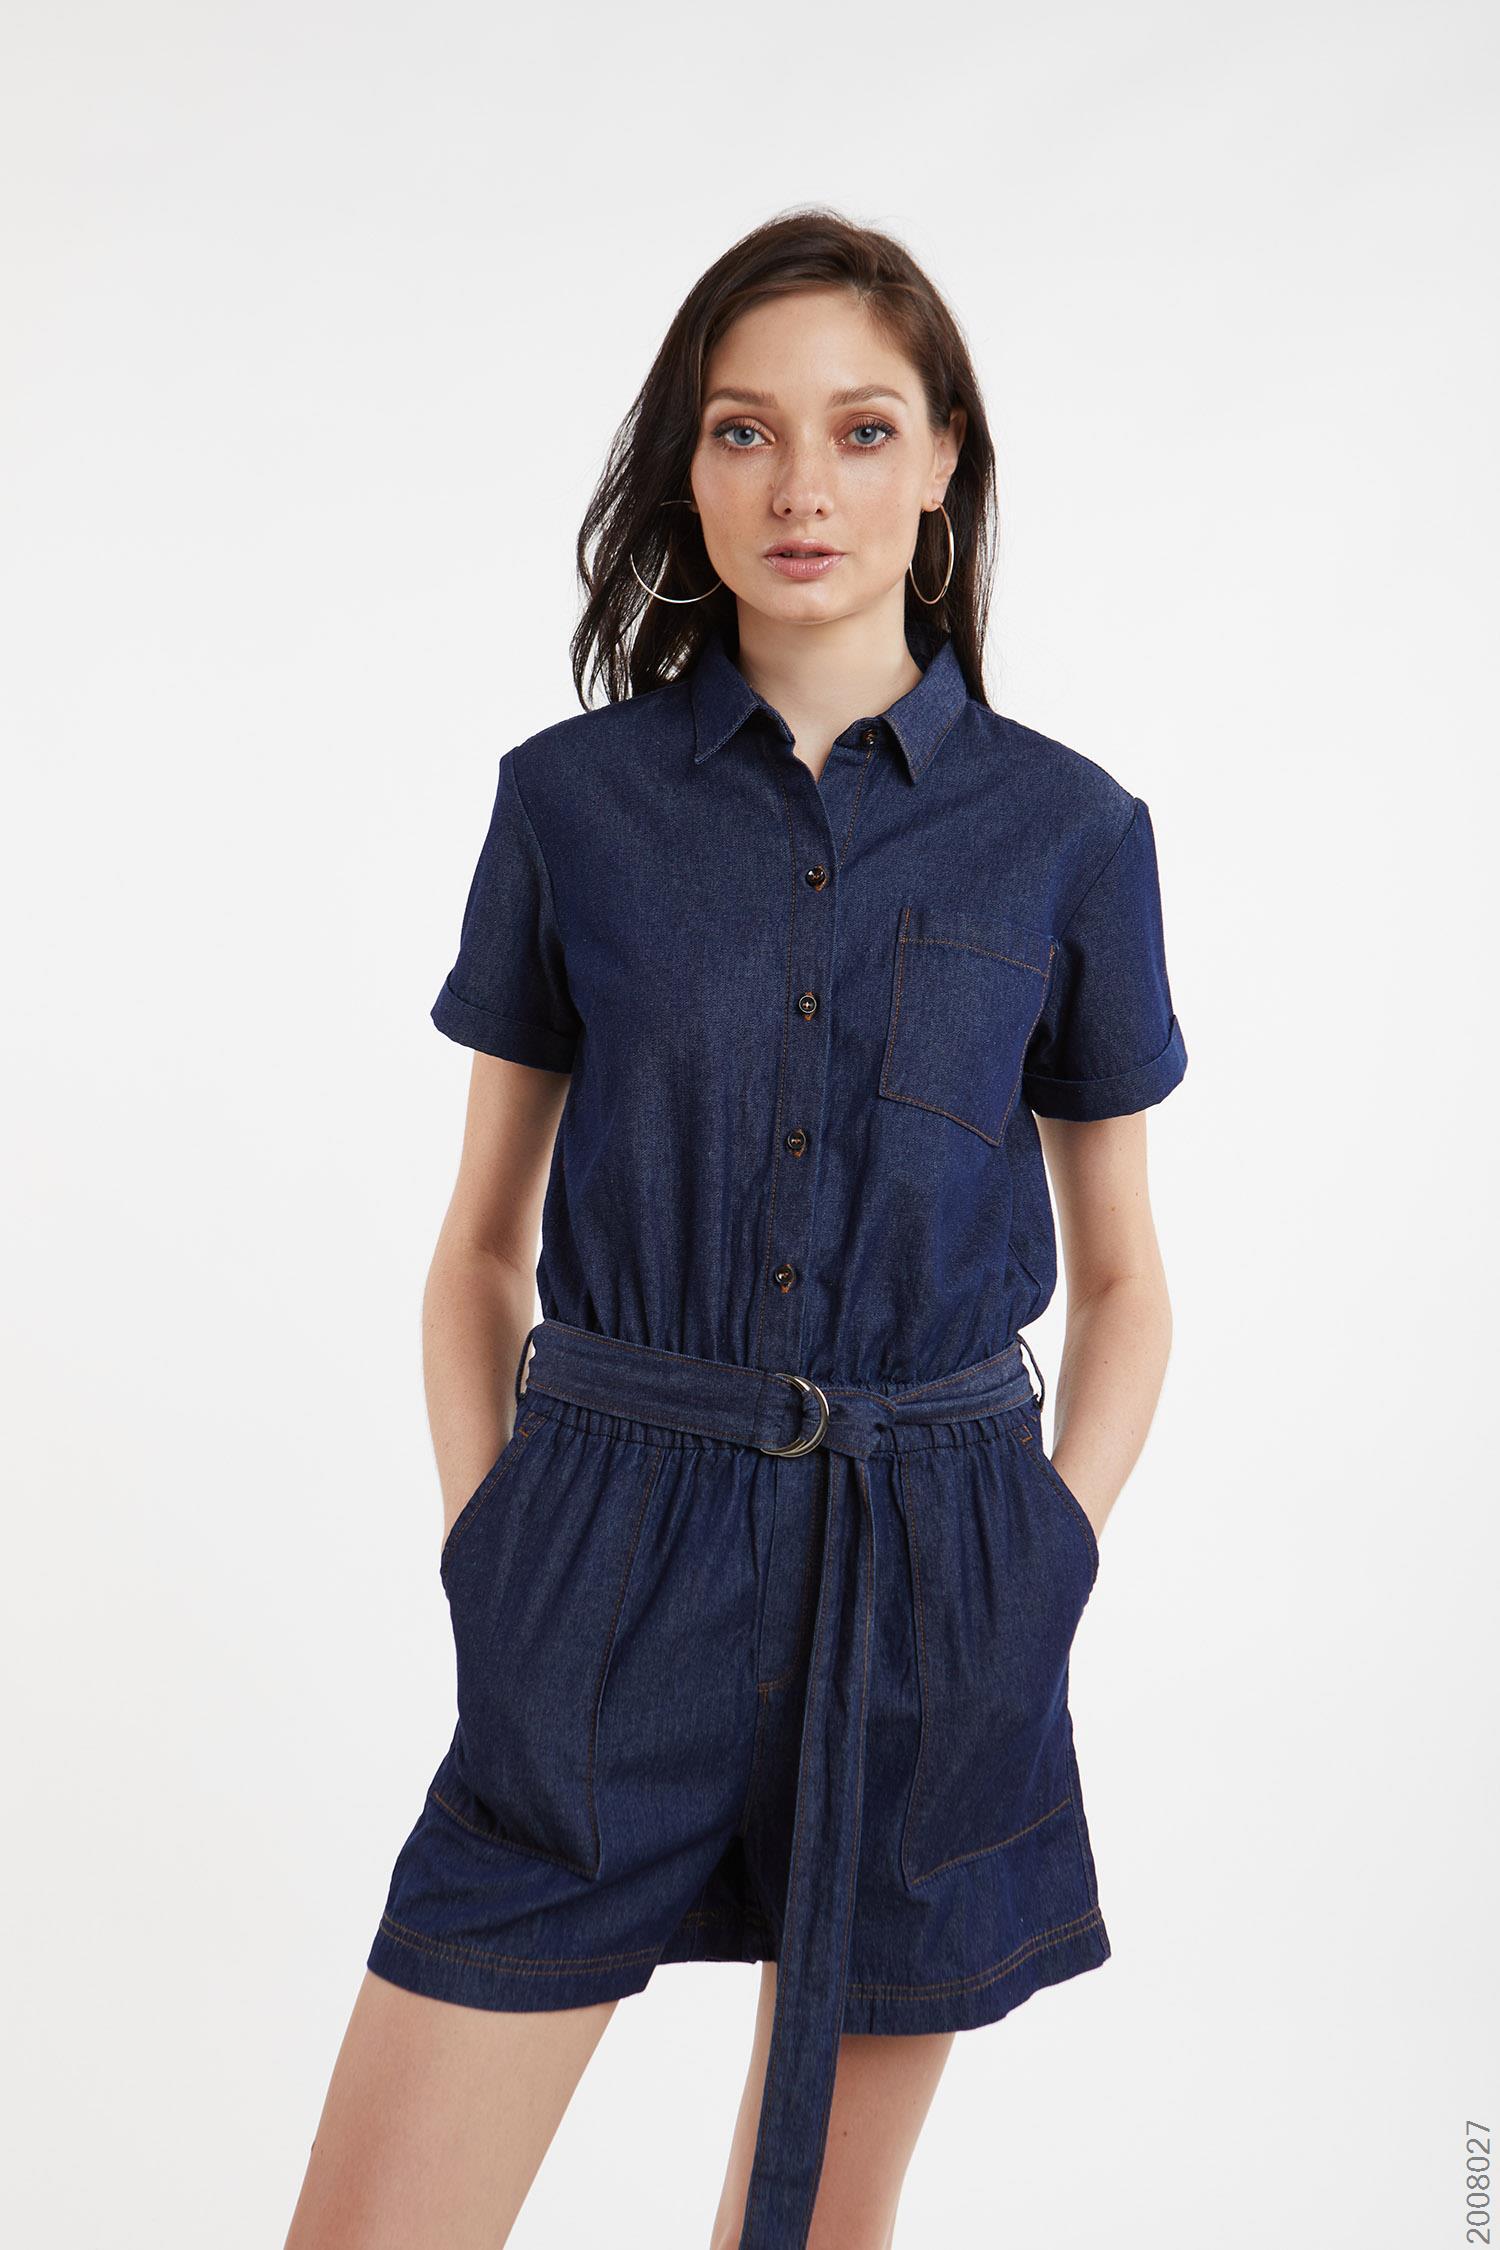 áo liền quần nữ - 2008027